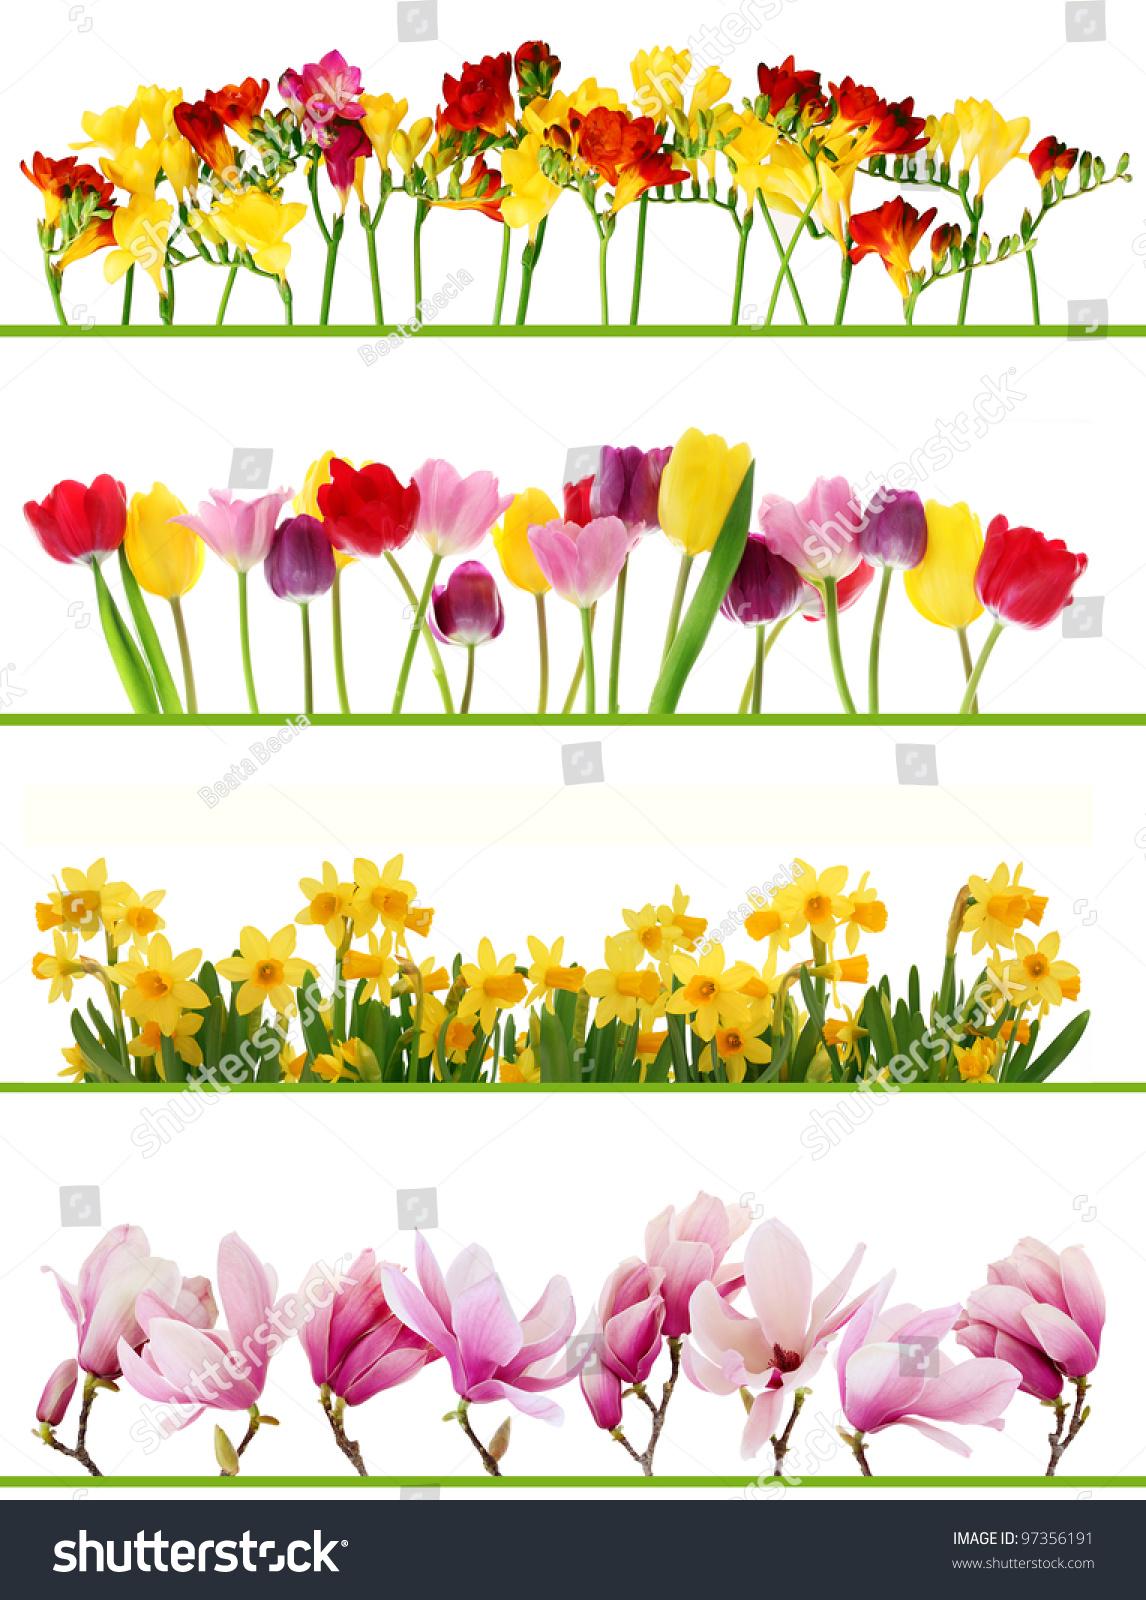 Royalty free colorful fresh spring flowers borders 97356191 stock colorful fresh spring flowers borders on white background tulips daffodils freesia magnolia mightylinksfo